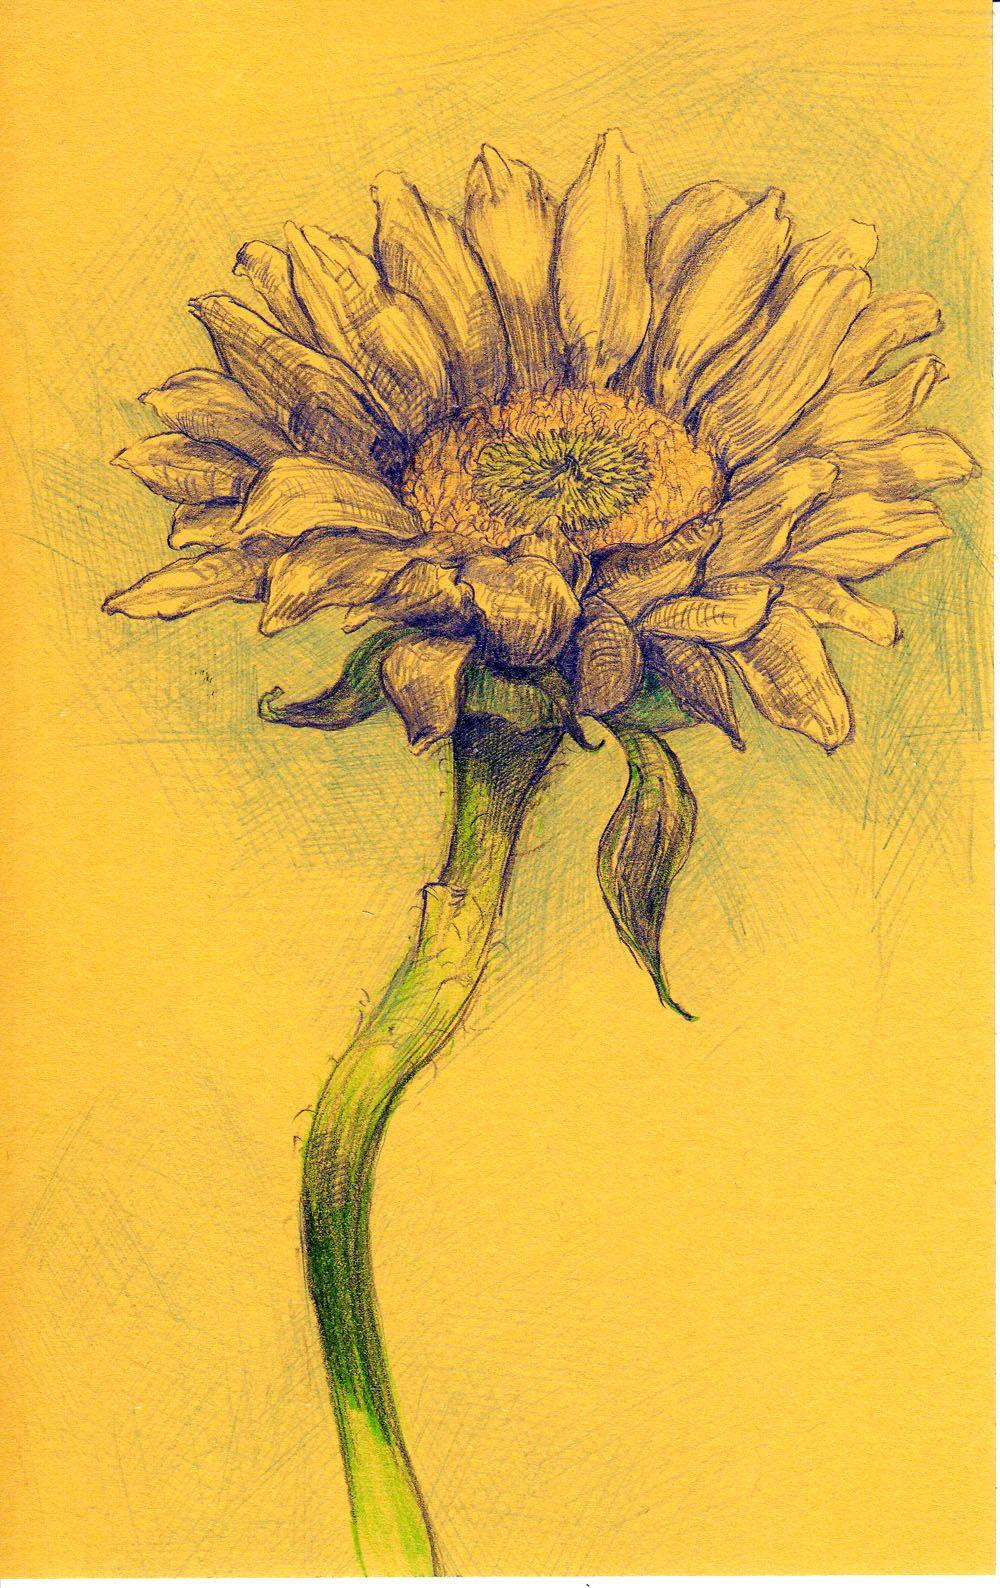 Sunflower perfect tattoo tattoos pinterest sunflowers tattoo